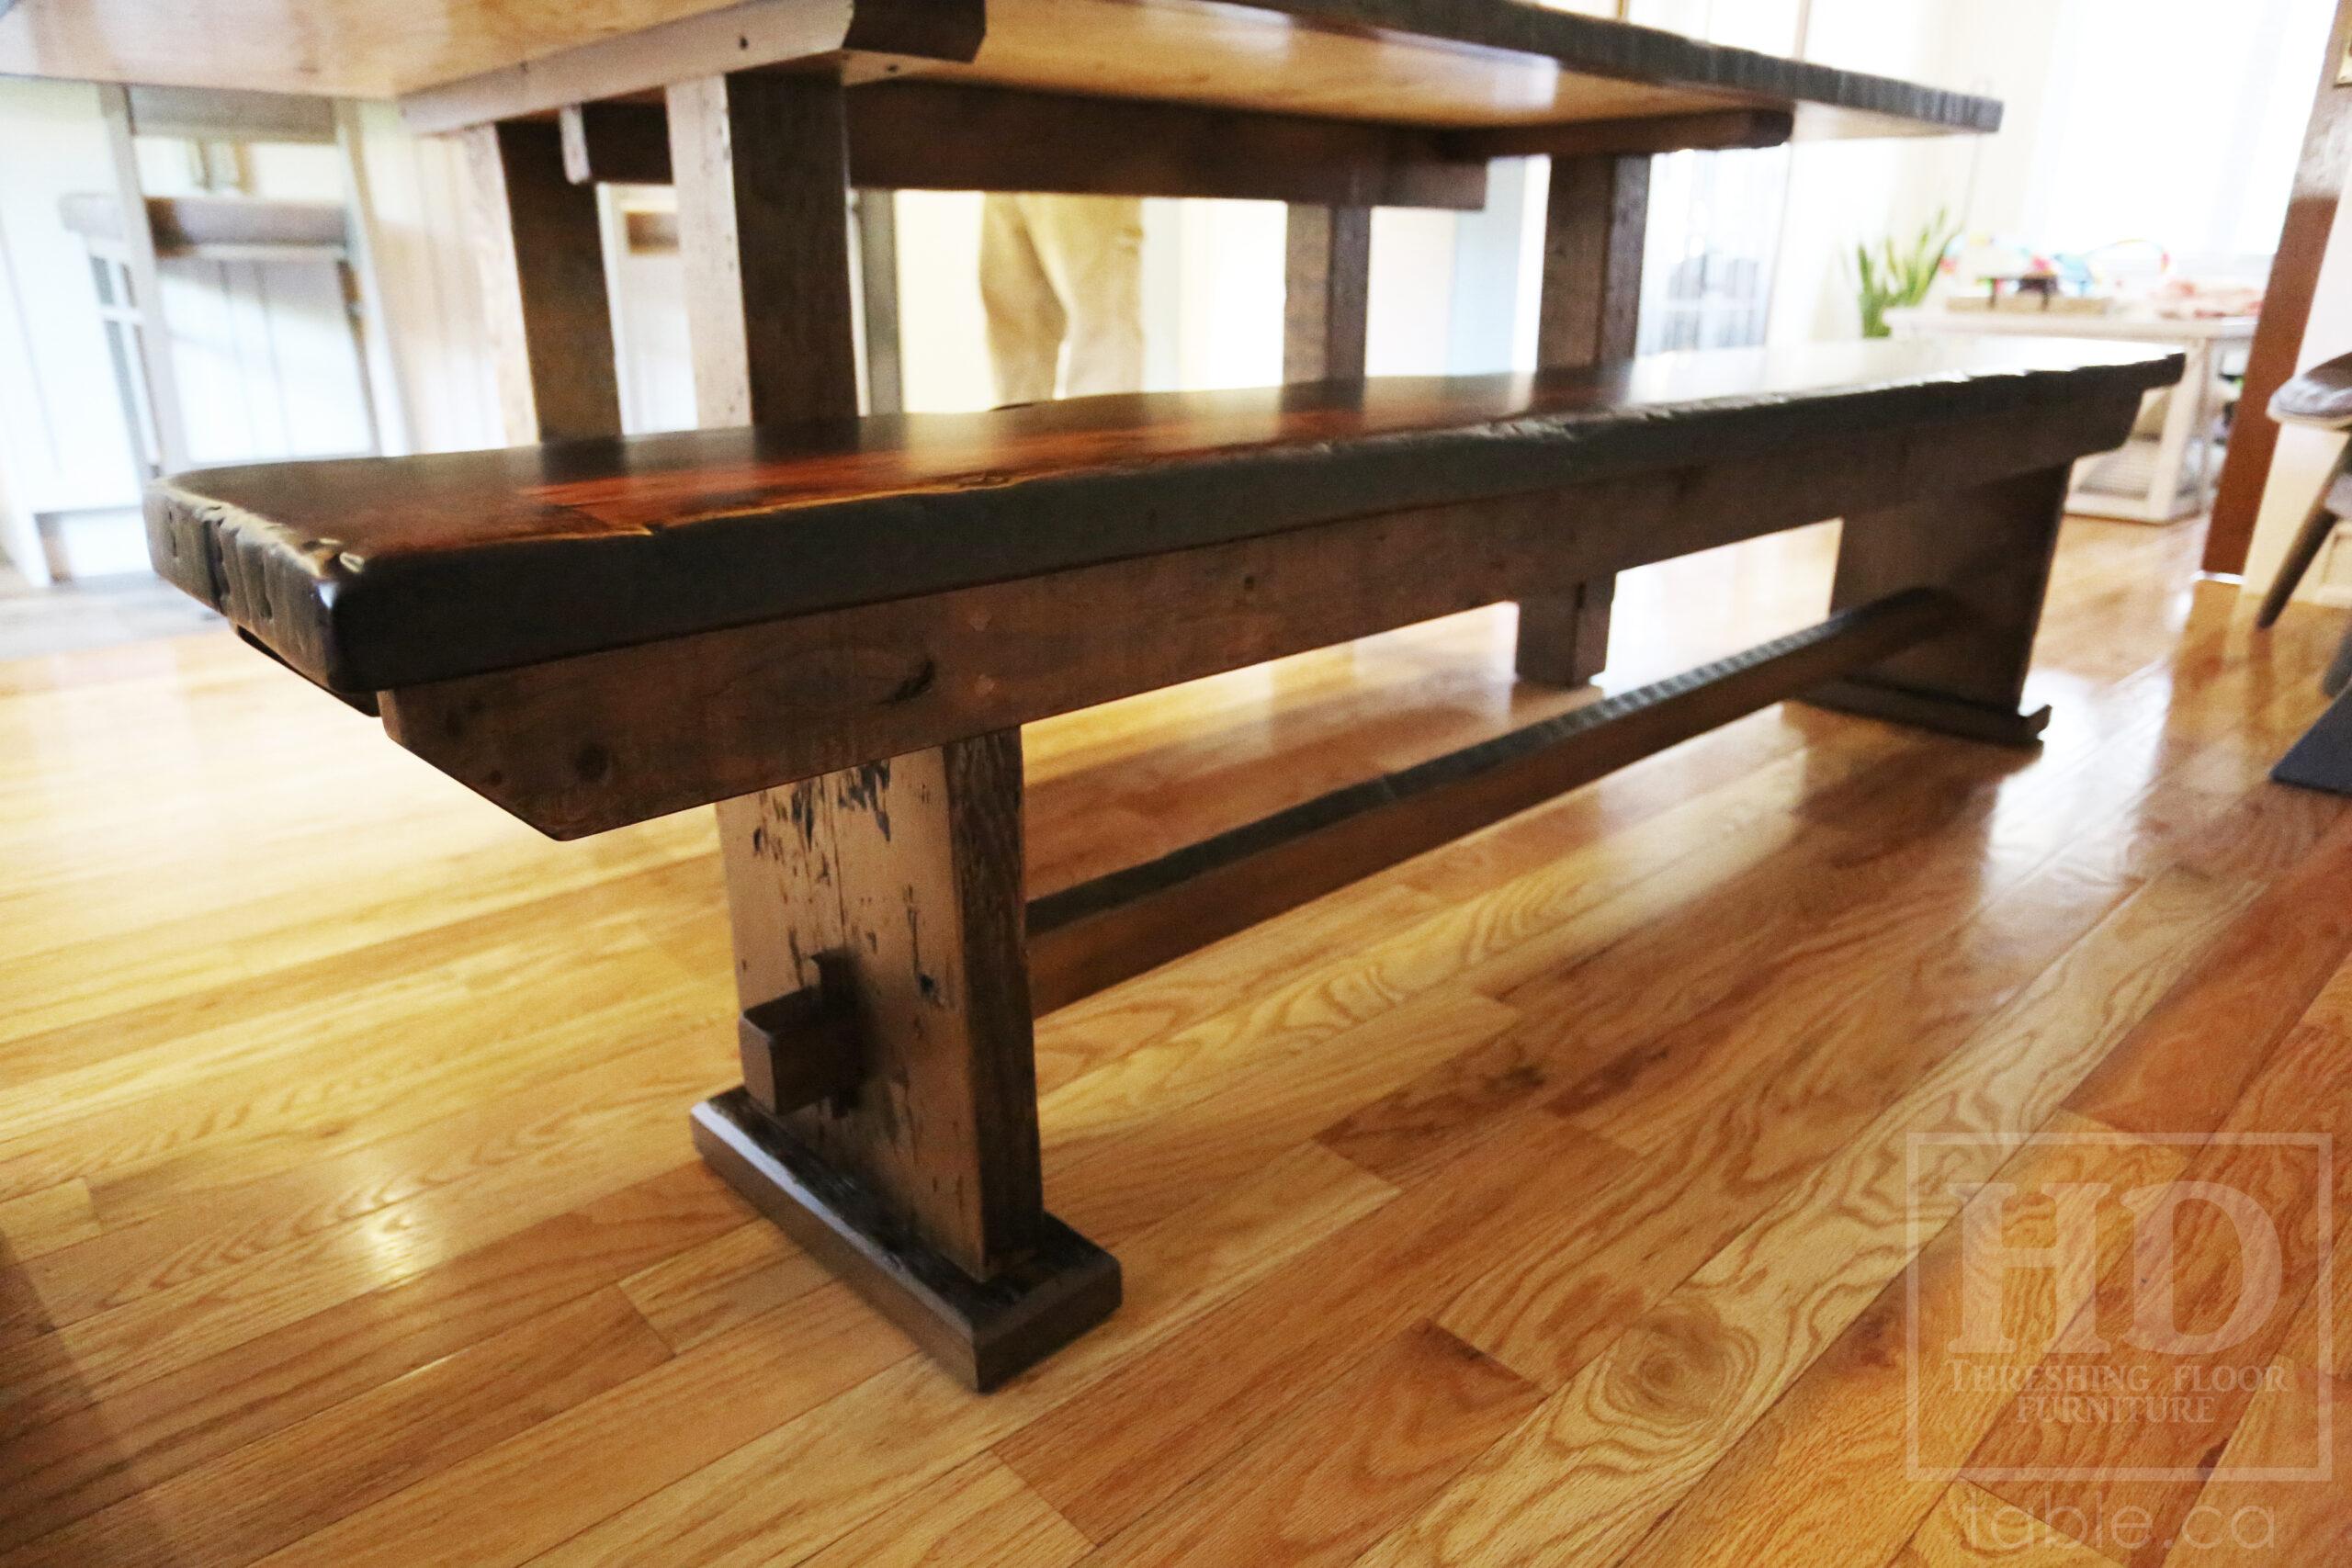 "7' Ontario Barnwood table we made for a  Hamilton, Ontario Home - 42"" wide -  2"" Hemlock Threshing Floor Construction - Original Ontario barnwood edges & distressing maintained - Premium epoxy + satin polyurethane finish - www.table.ca7' Ontario Barnwood table we made for a  Hamilton, Ontario Home - 42"" wide -  2"" Hemlock Threshing Floor Construction - Original Ontario barnwood edges & distressing maintained - Premium epoxy + satin polyurethane finish - www.table.ca"